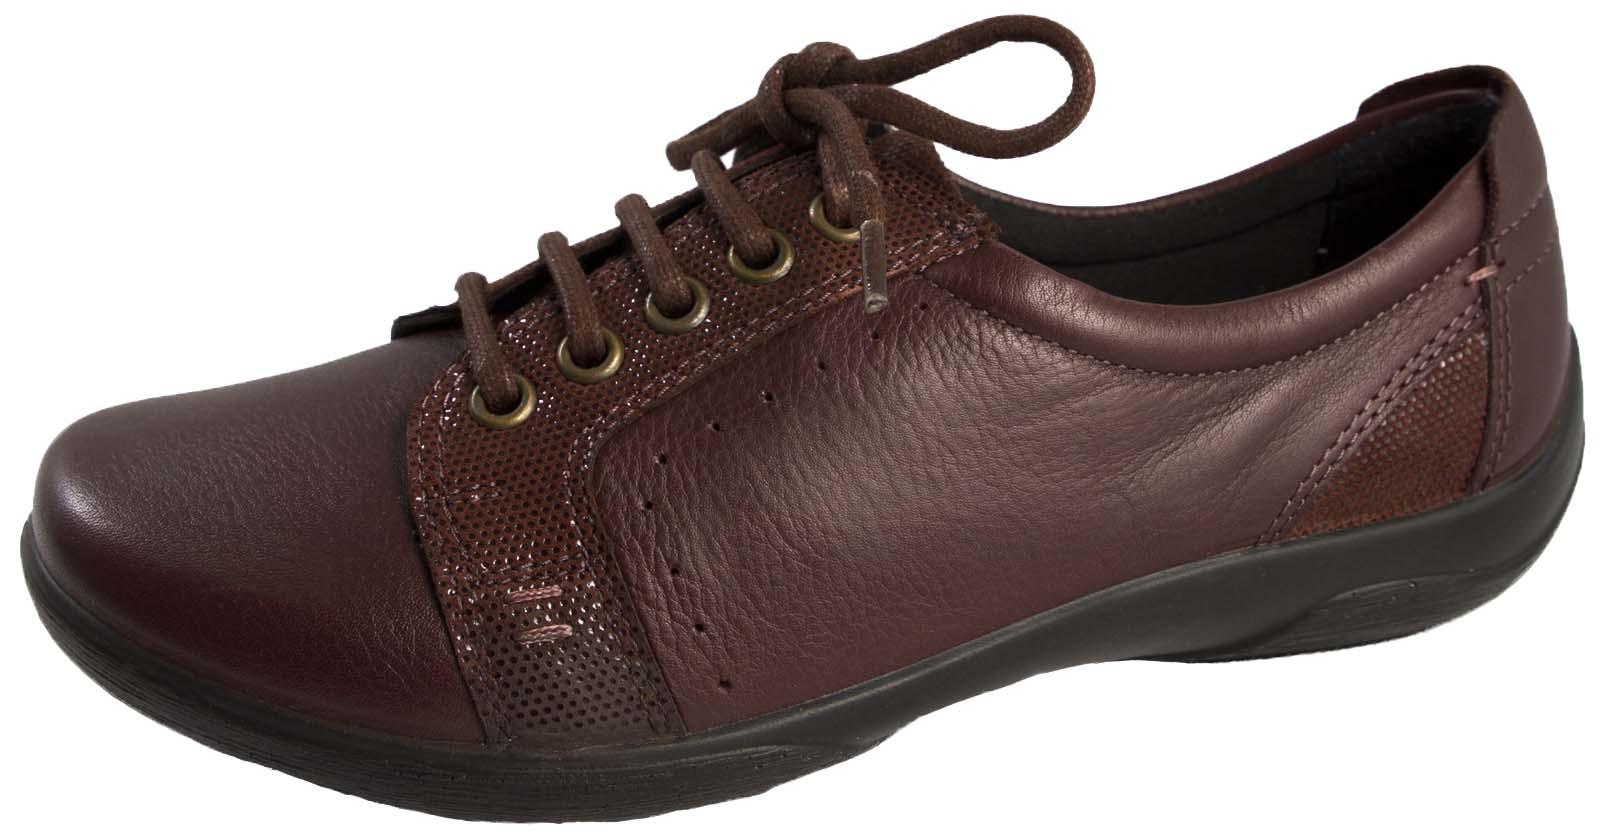 Orthopedic Wide Womens Shoes